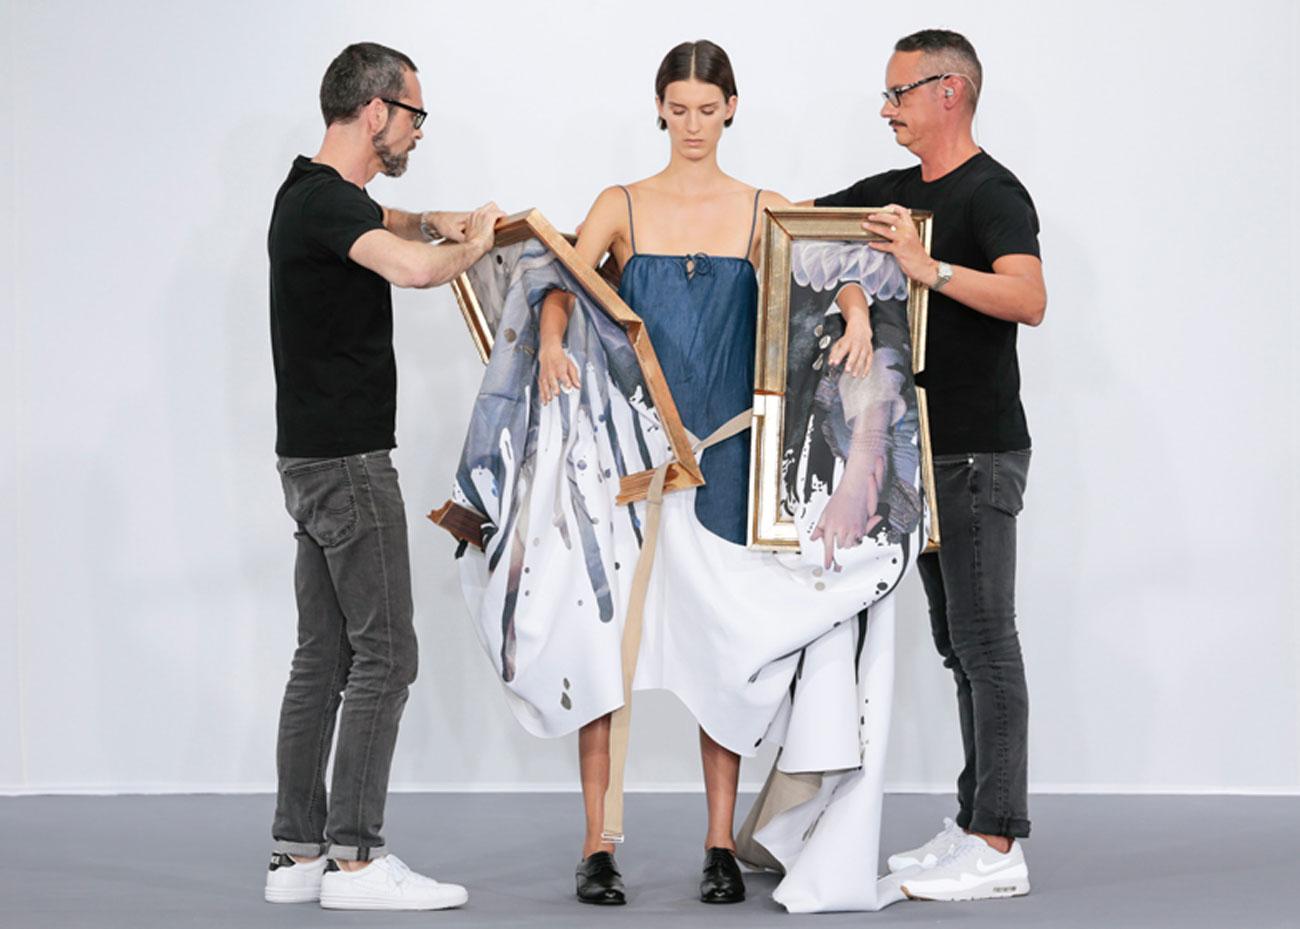 Viktor Rolf AW15 Wearable Art collection model